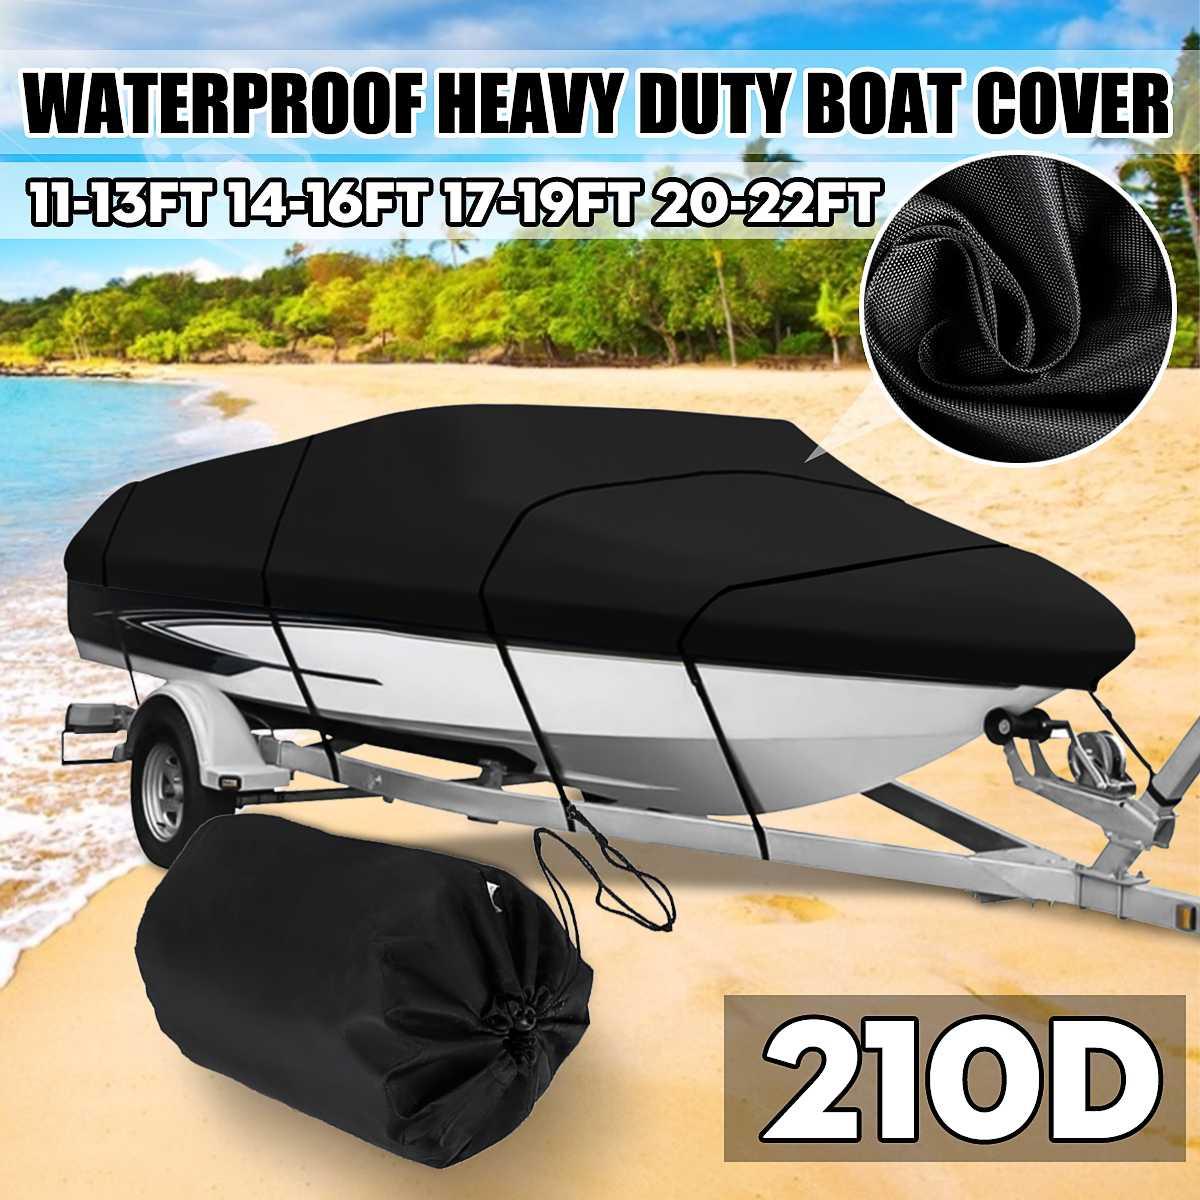 11-13ft 14-16ft 17-19ft 20-22ft Black Marine Grade Boat Cover Sunproof Anti UV Premium Heavy Duty 210D Trailerable Canvas